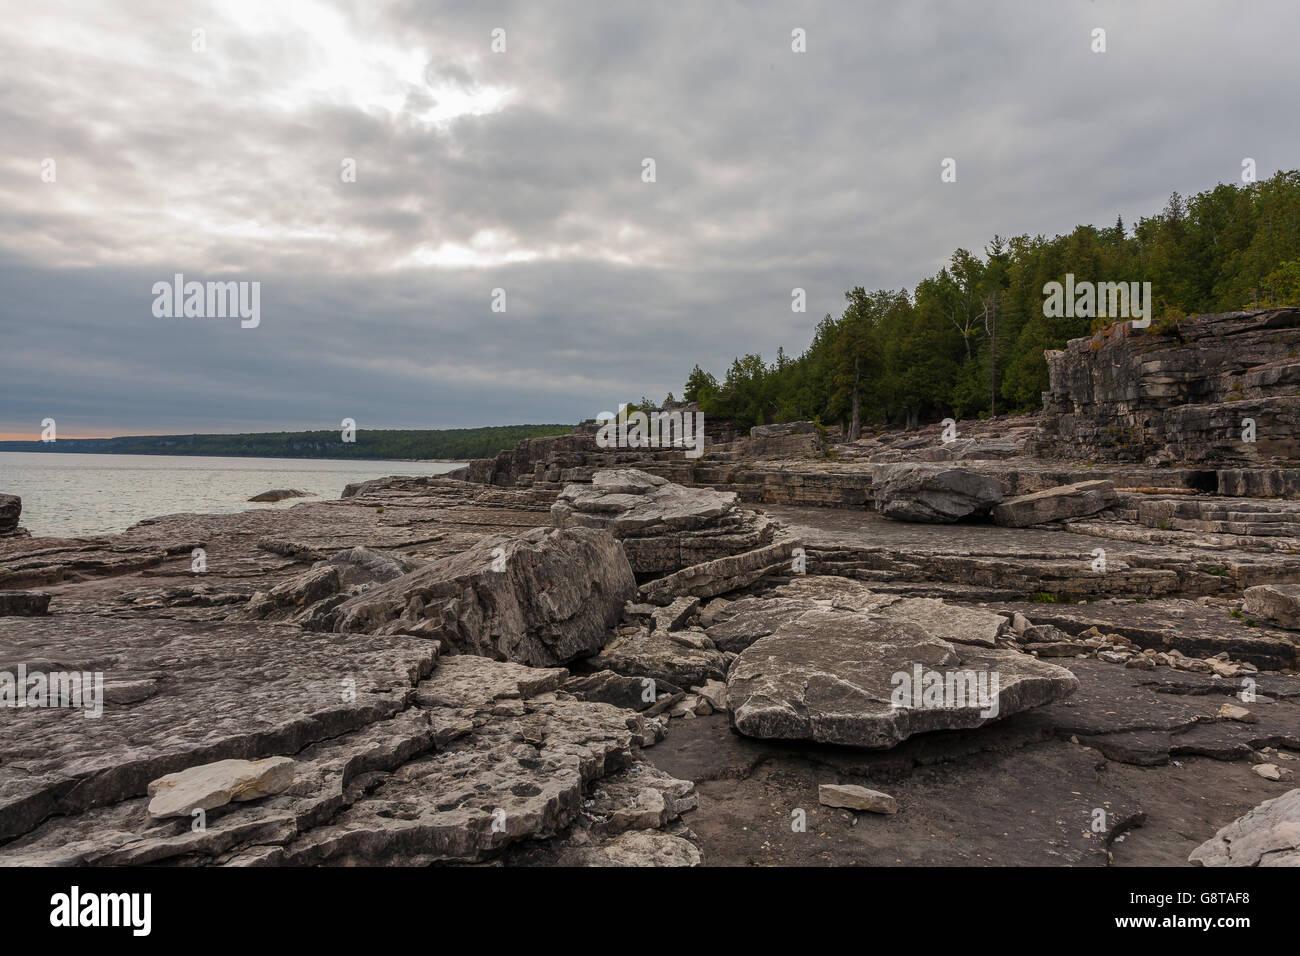 Rocky beach at Halfway Log Dump in Bruce Peninsula National Park near Tobermory, Ontario, Canada - Stock Image